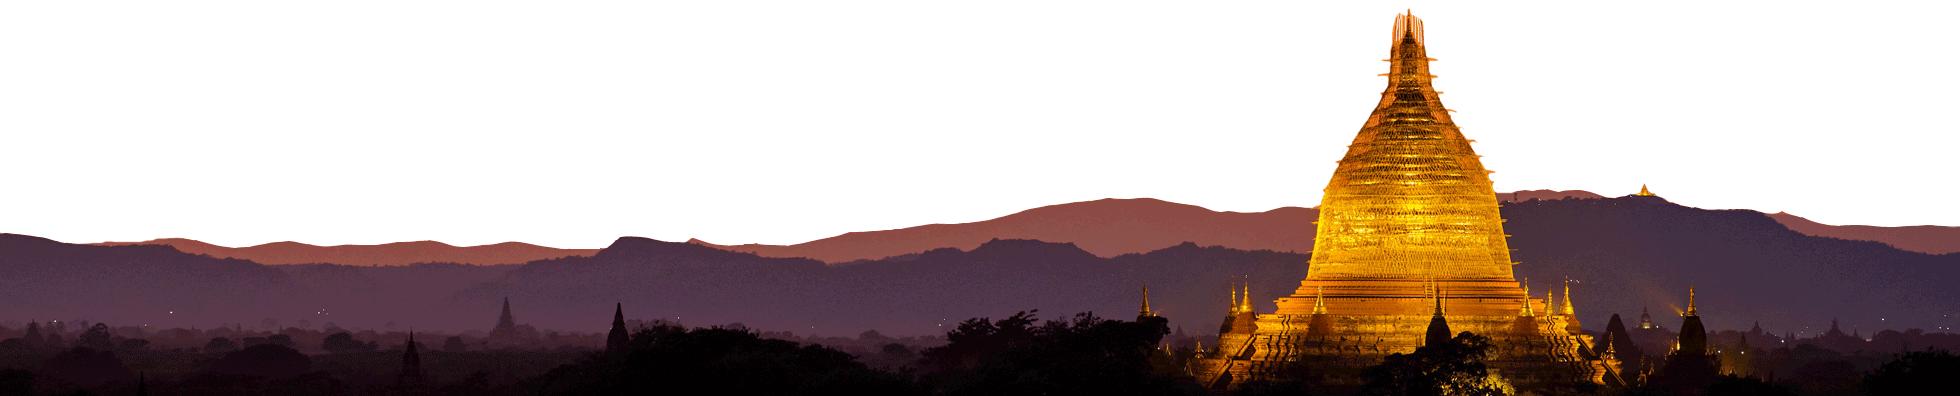 Paysage Myanmar